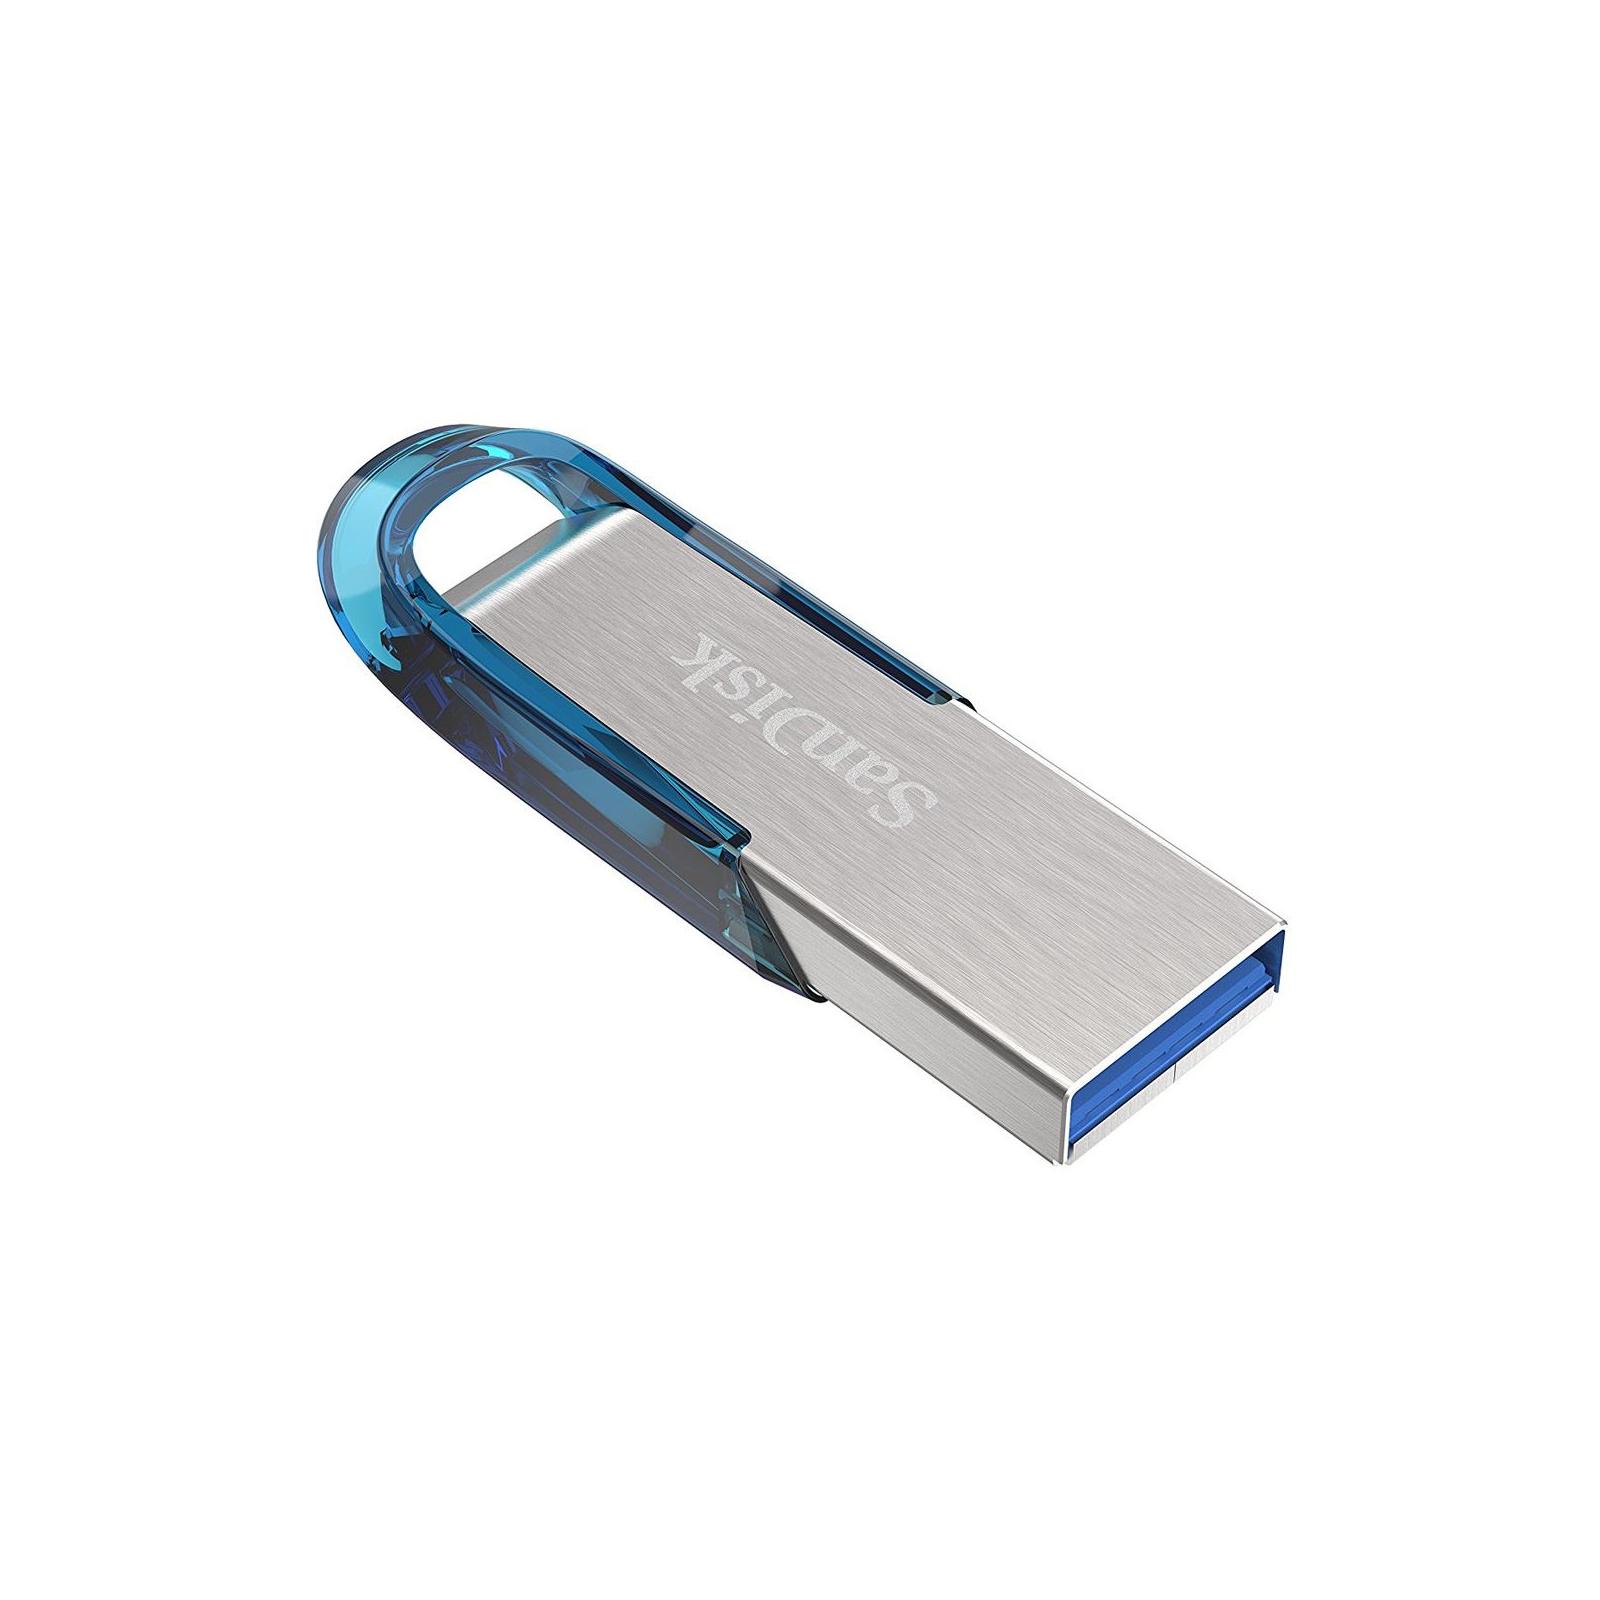 USB флеш накопитель SANDISK 32GB Ultra Flair USB 3.0 (SDCZ73-032G-G46) изображение 4